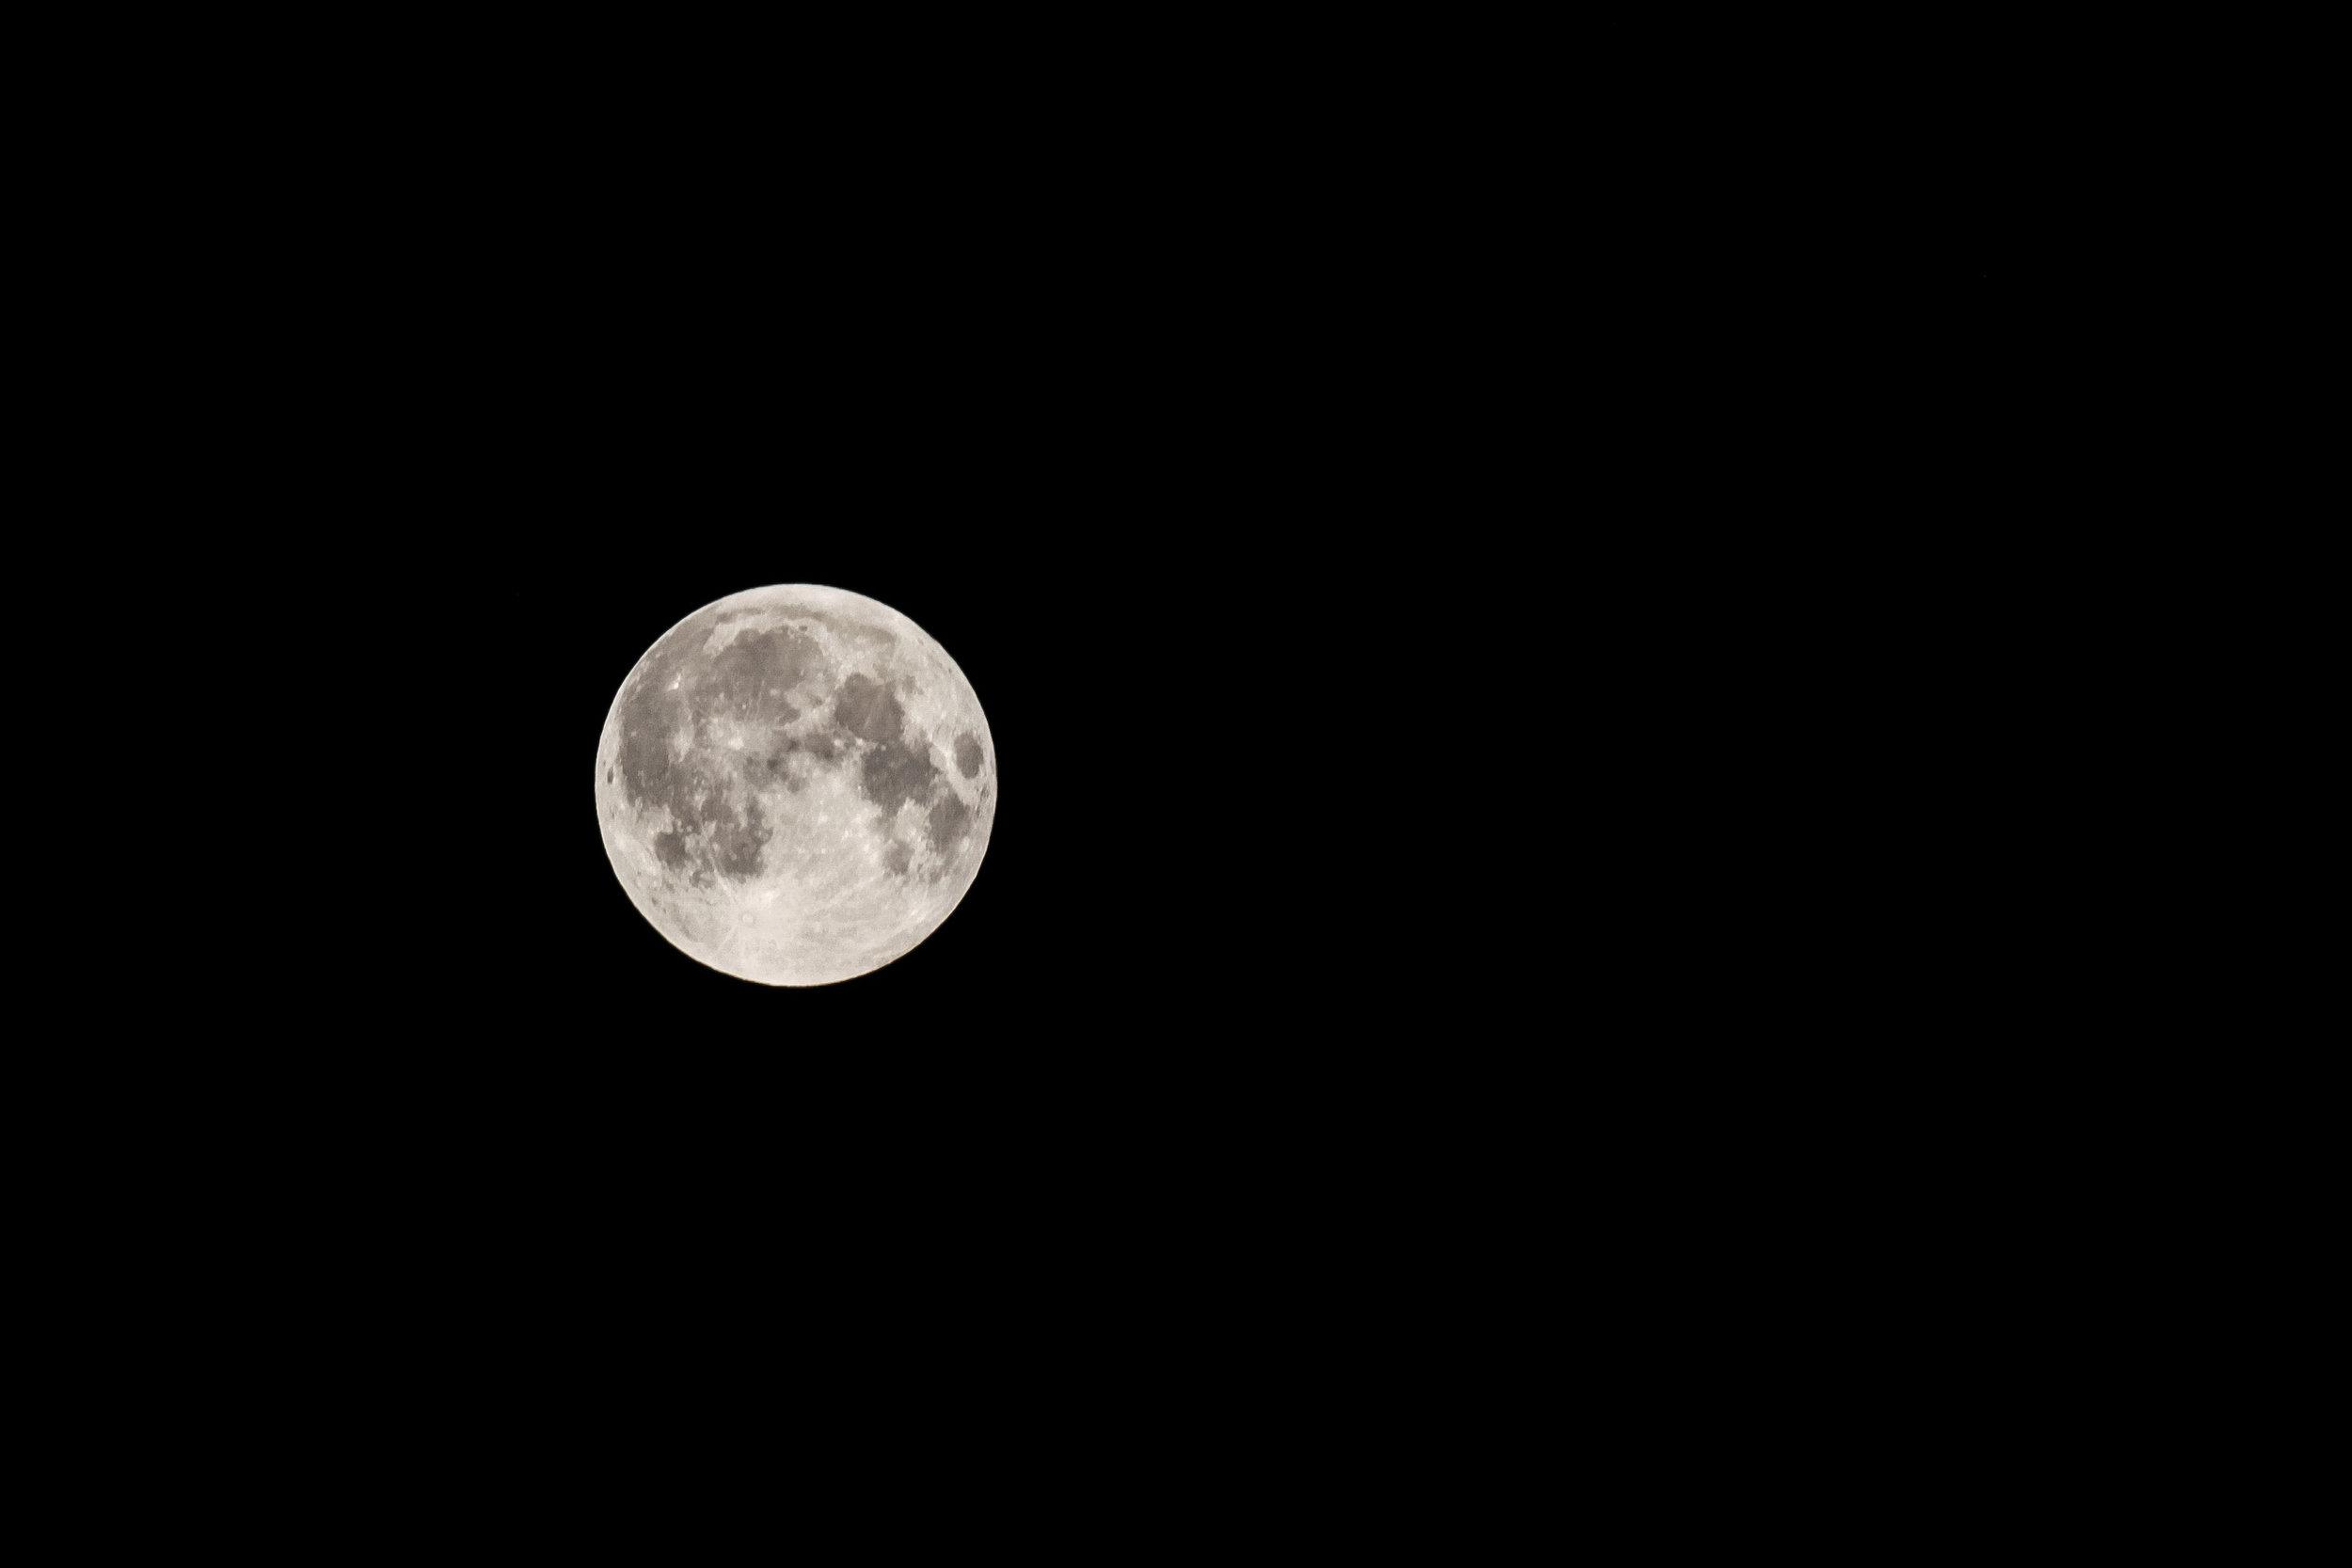 foto luna eclissi lunare 2018 astrofotografia